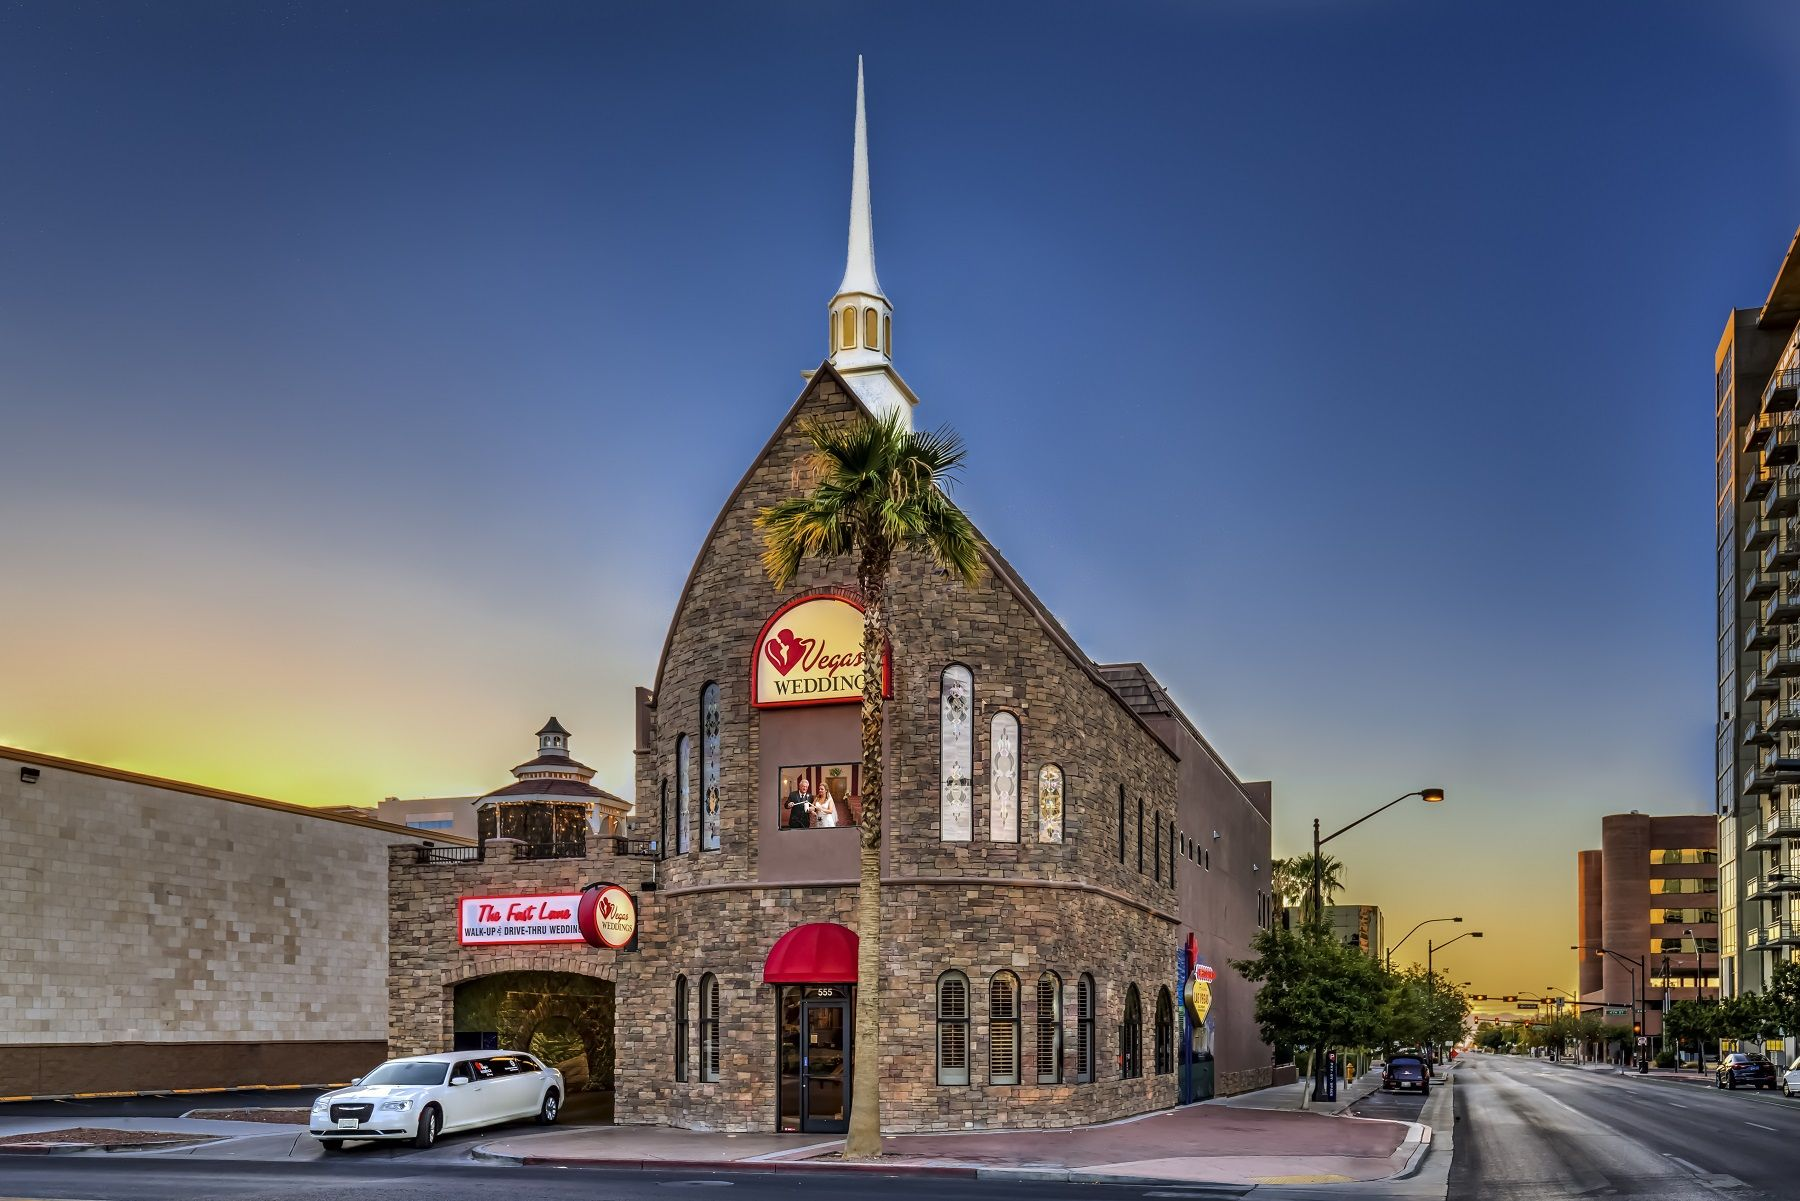 Award-winning Vegas Weddings chapel